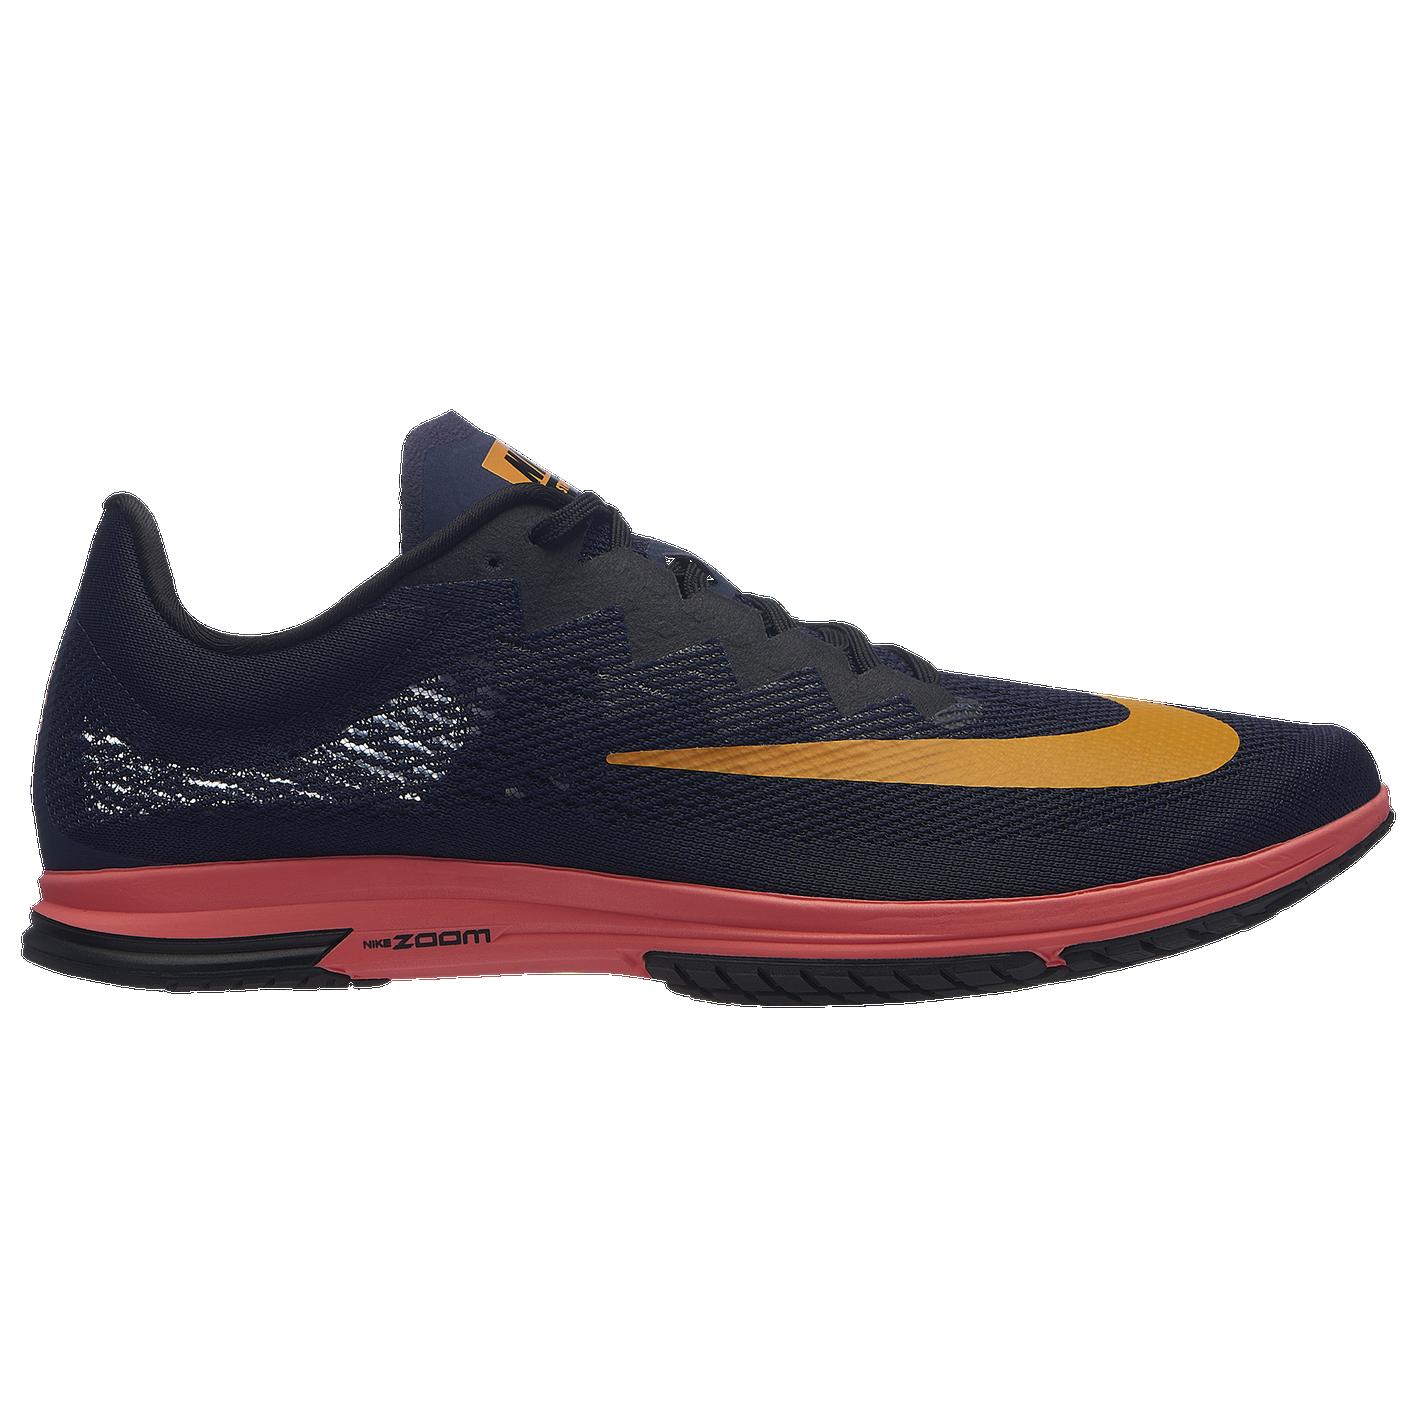 3b1df1fc2362b6 Nike Zoom Streak LT 4 - Men s - Track   Field - Shoes - Blackened ...